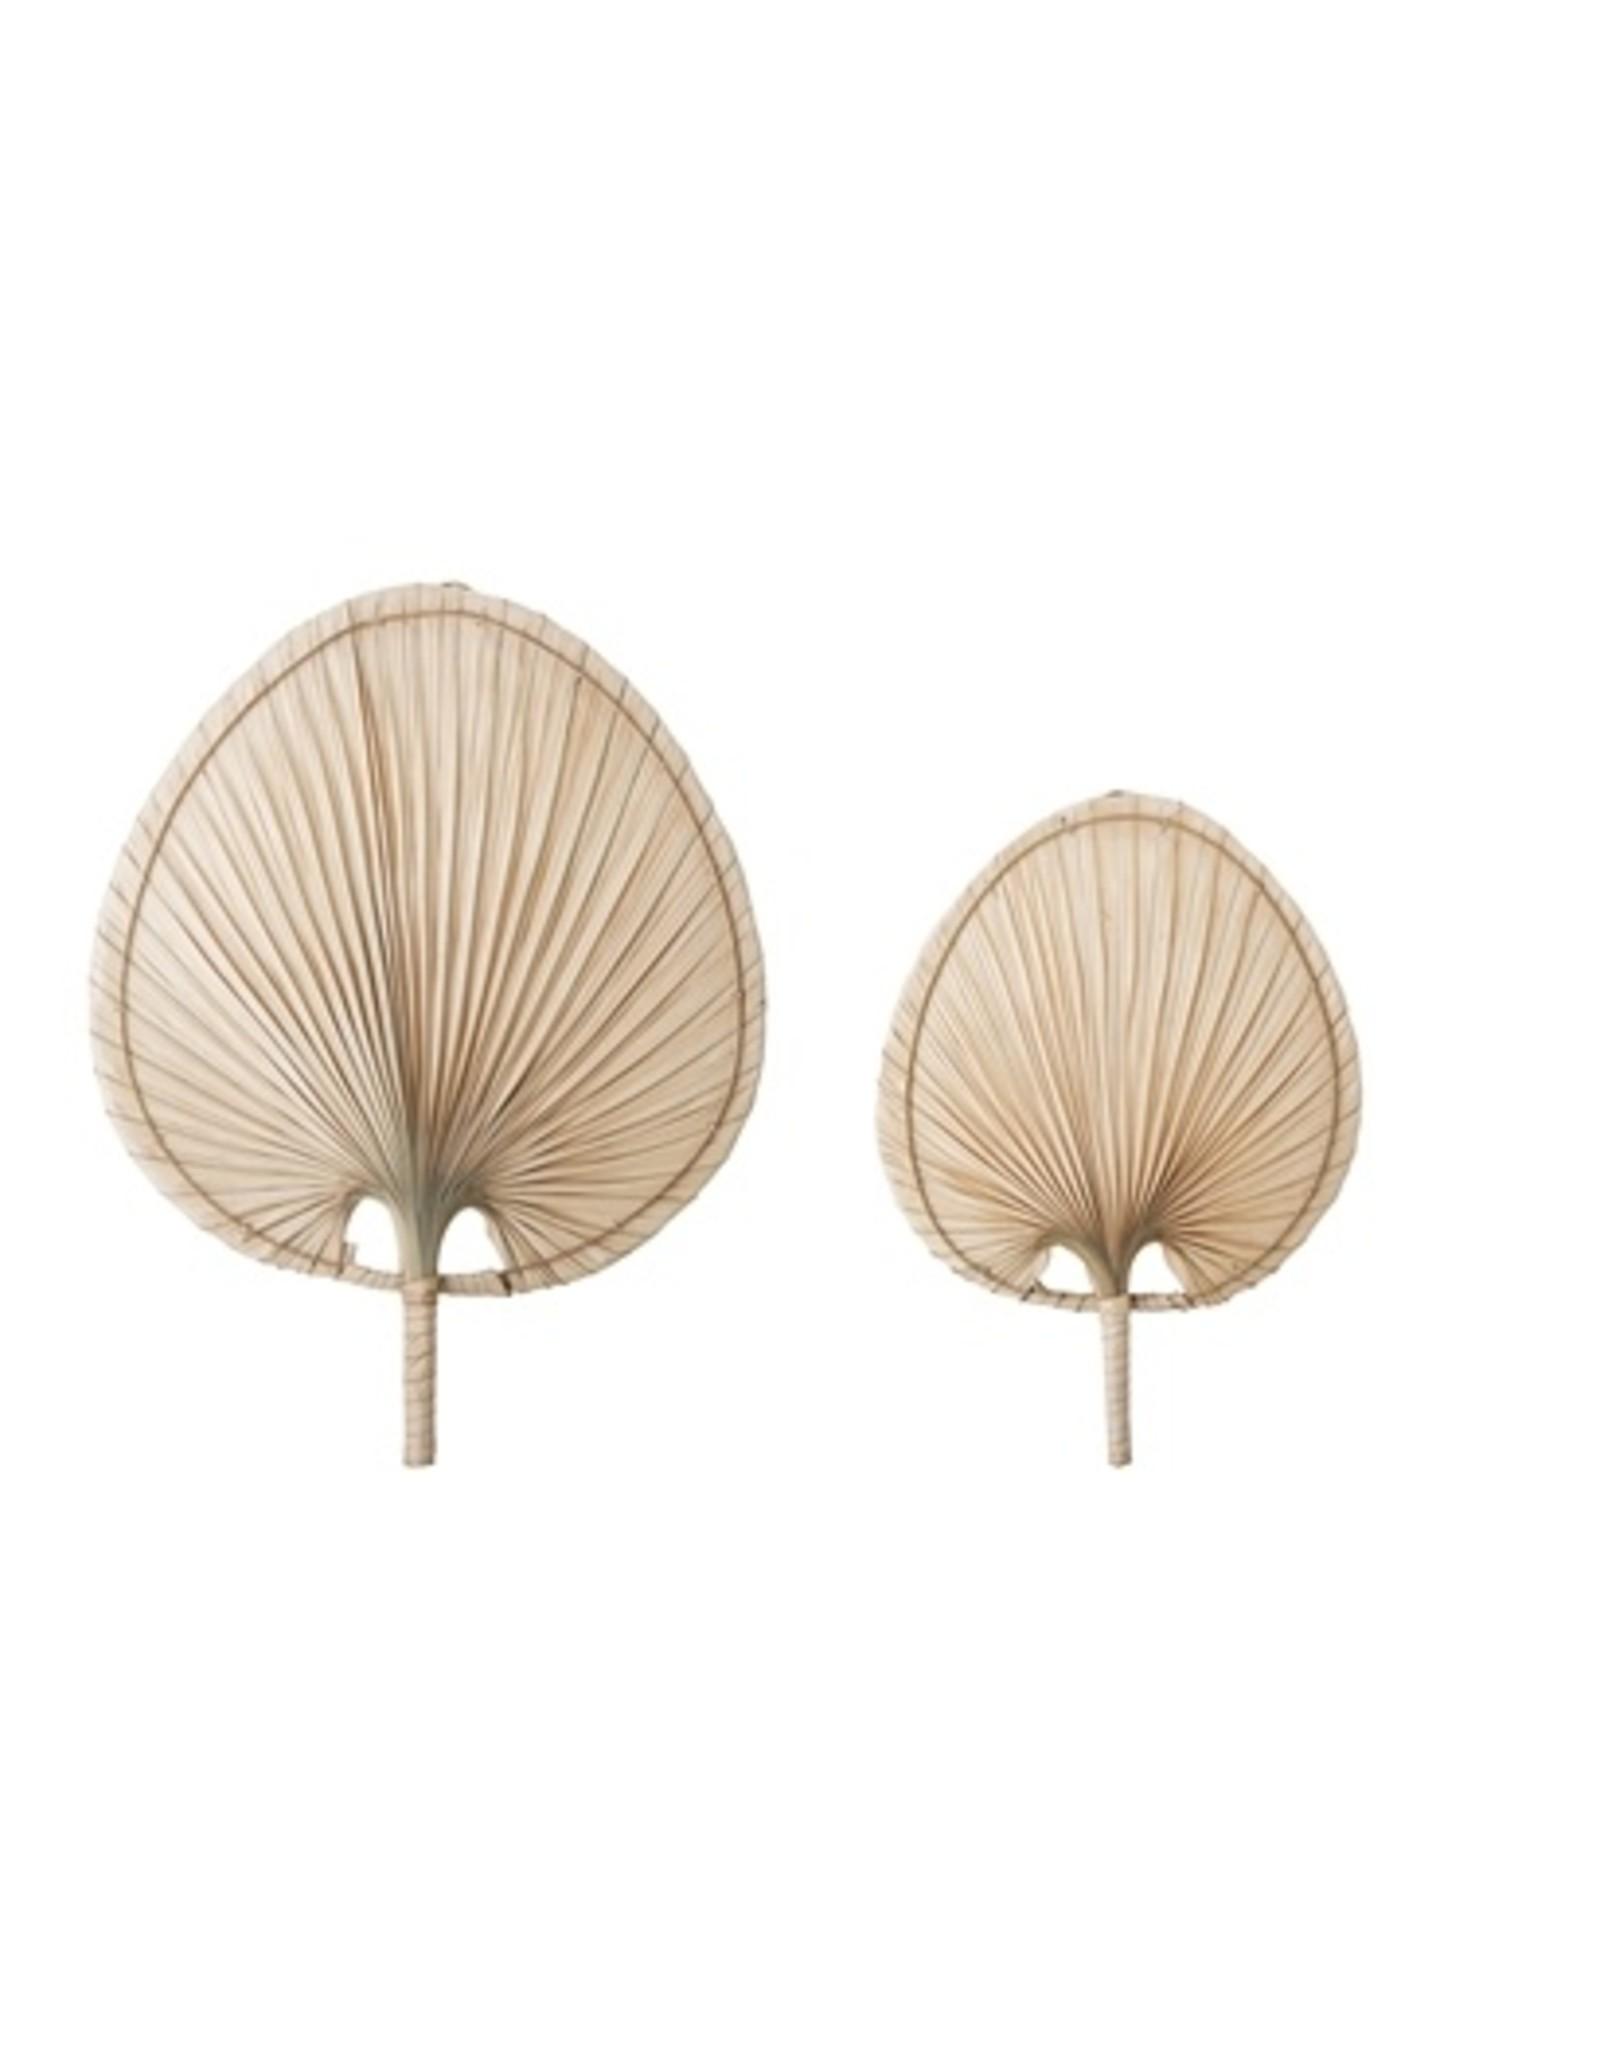 Muur deco palm blad Set van 2